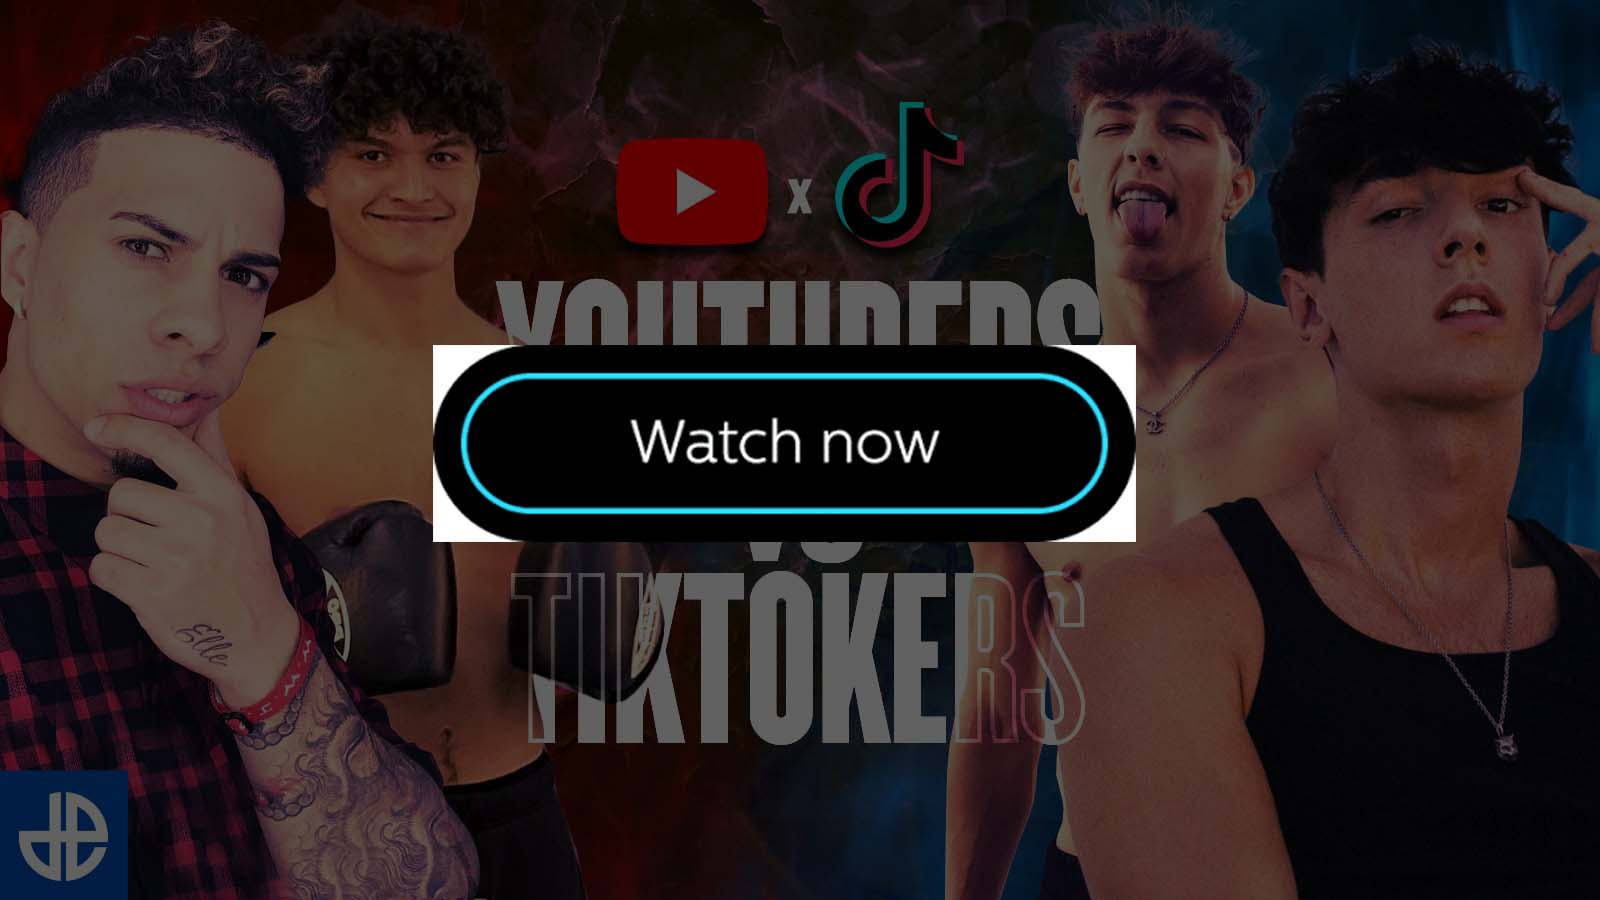 4k HD Crackstreams Watch Bryce Hall vs. Austin McBroom 2021 Live Stream Reddit Online Highlights